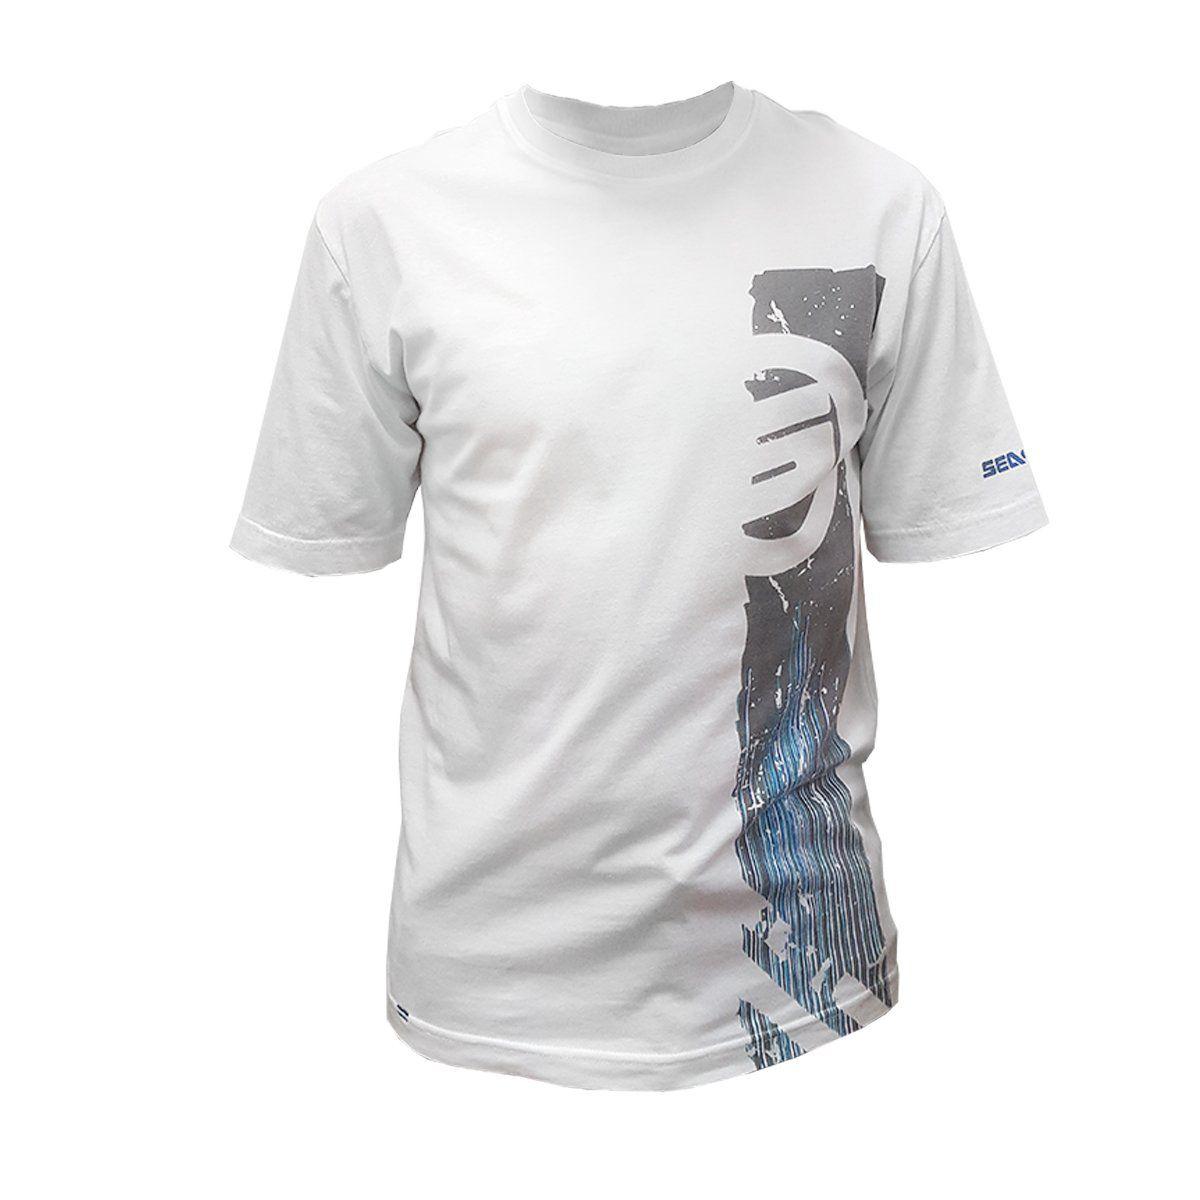 Camiseta Sea-Doo Vertical Branca